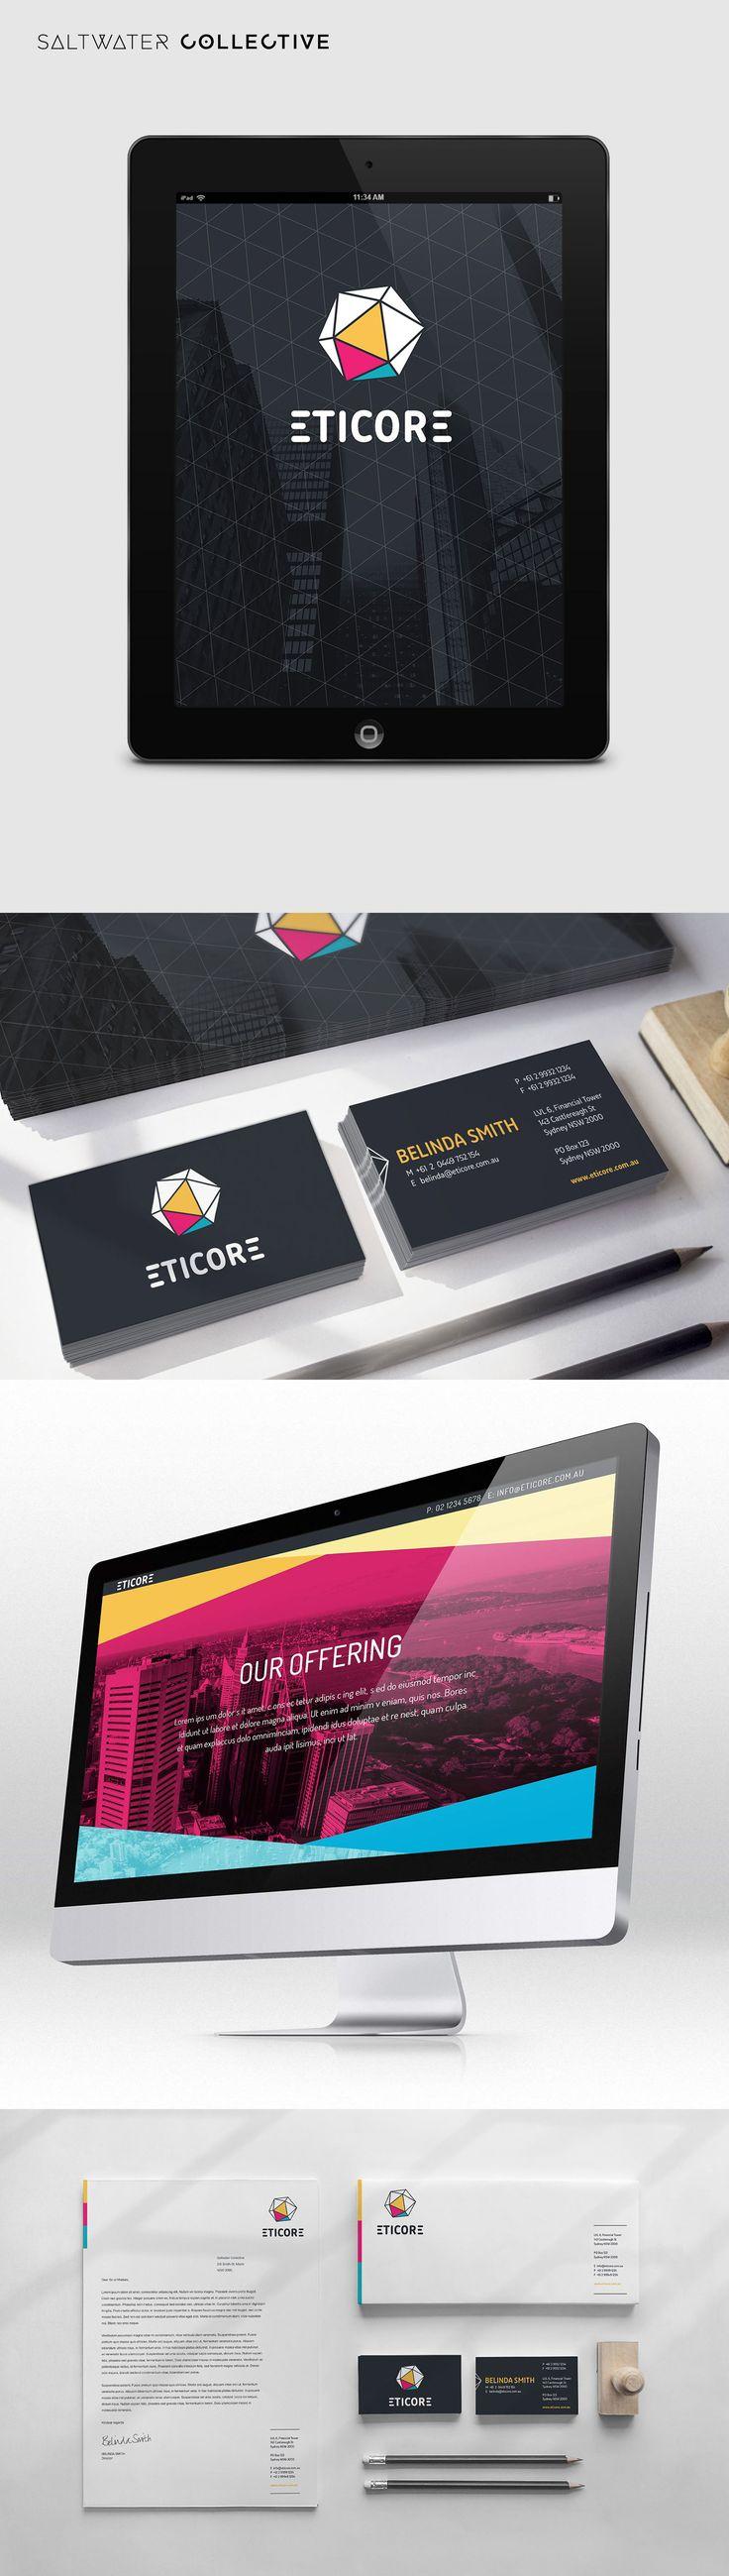 Eticore brand and website - #DesignedBySWC